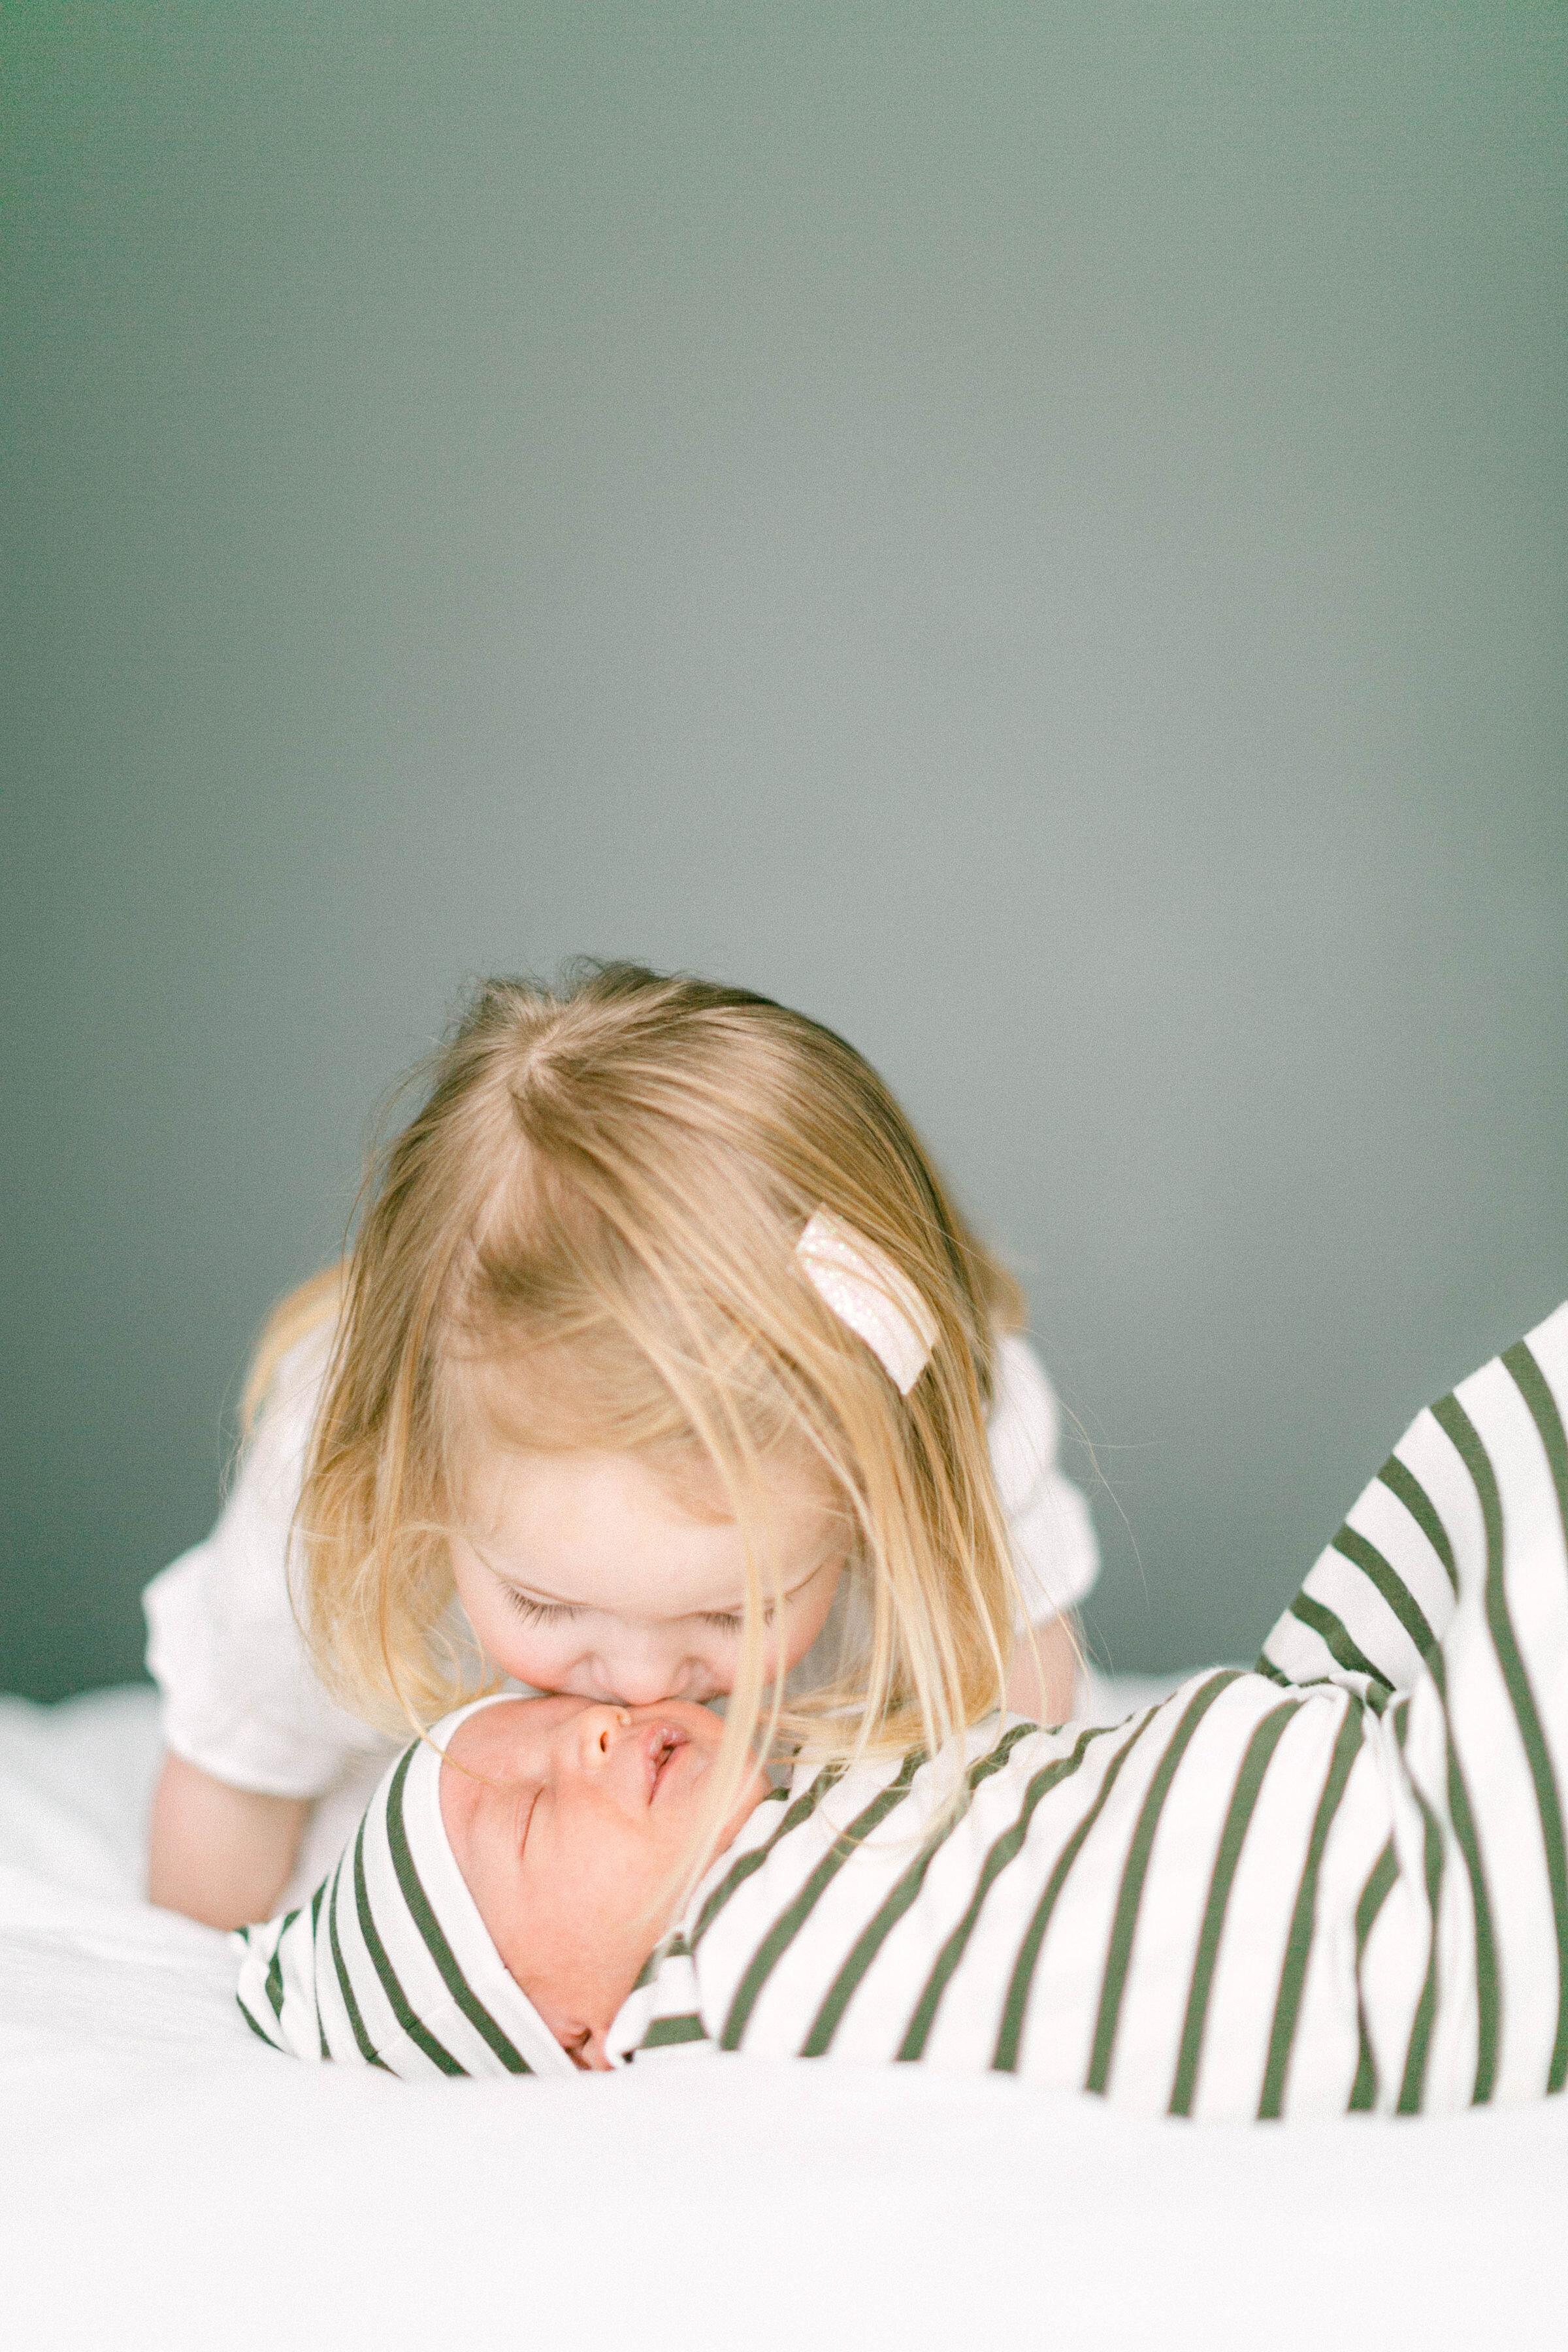 newborn portrait photography colorado